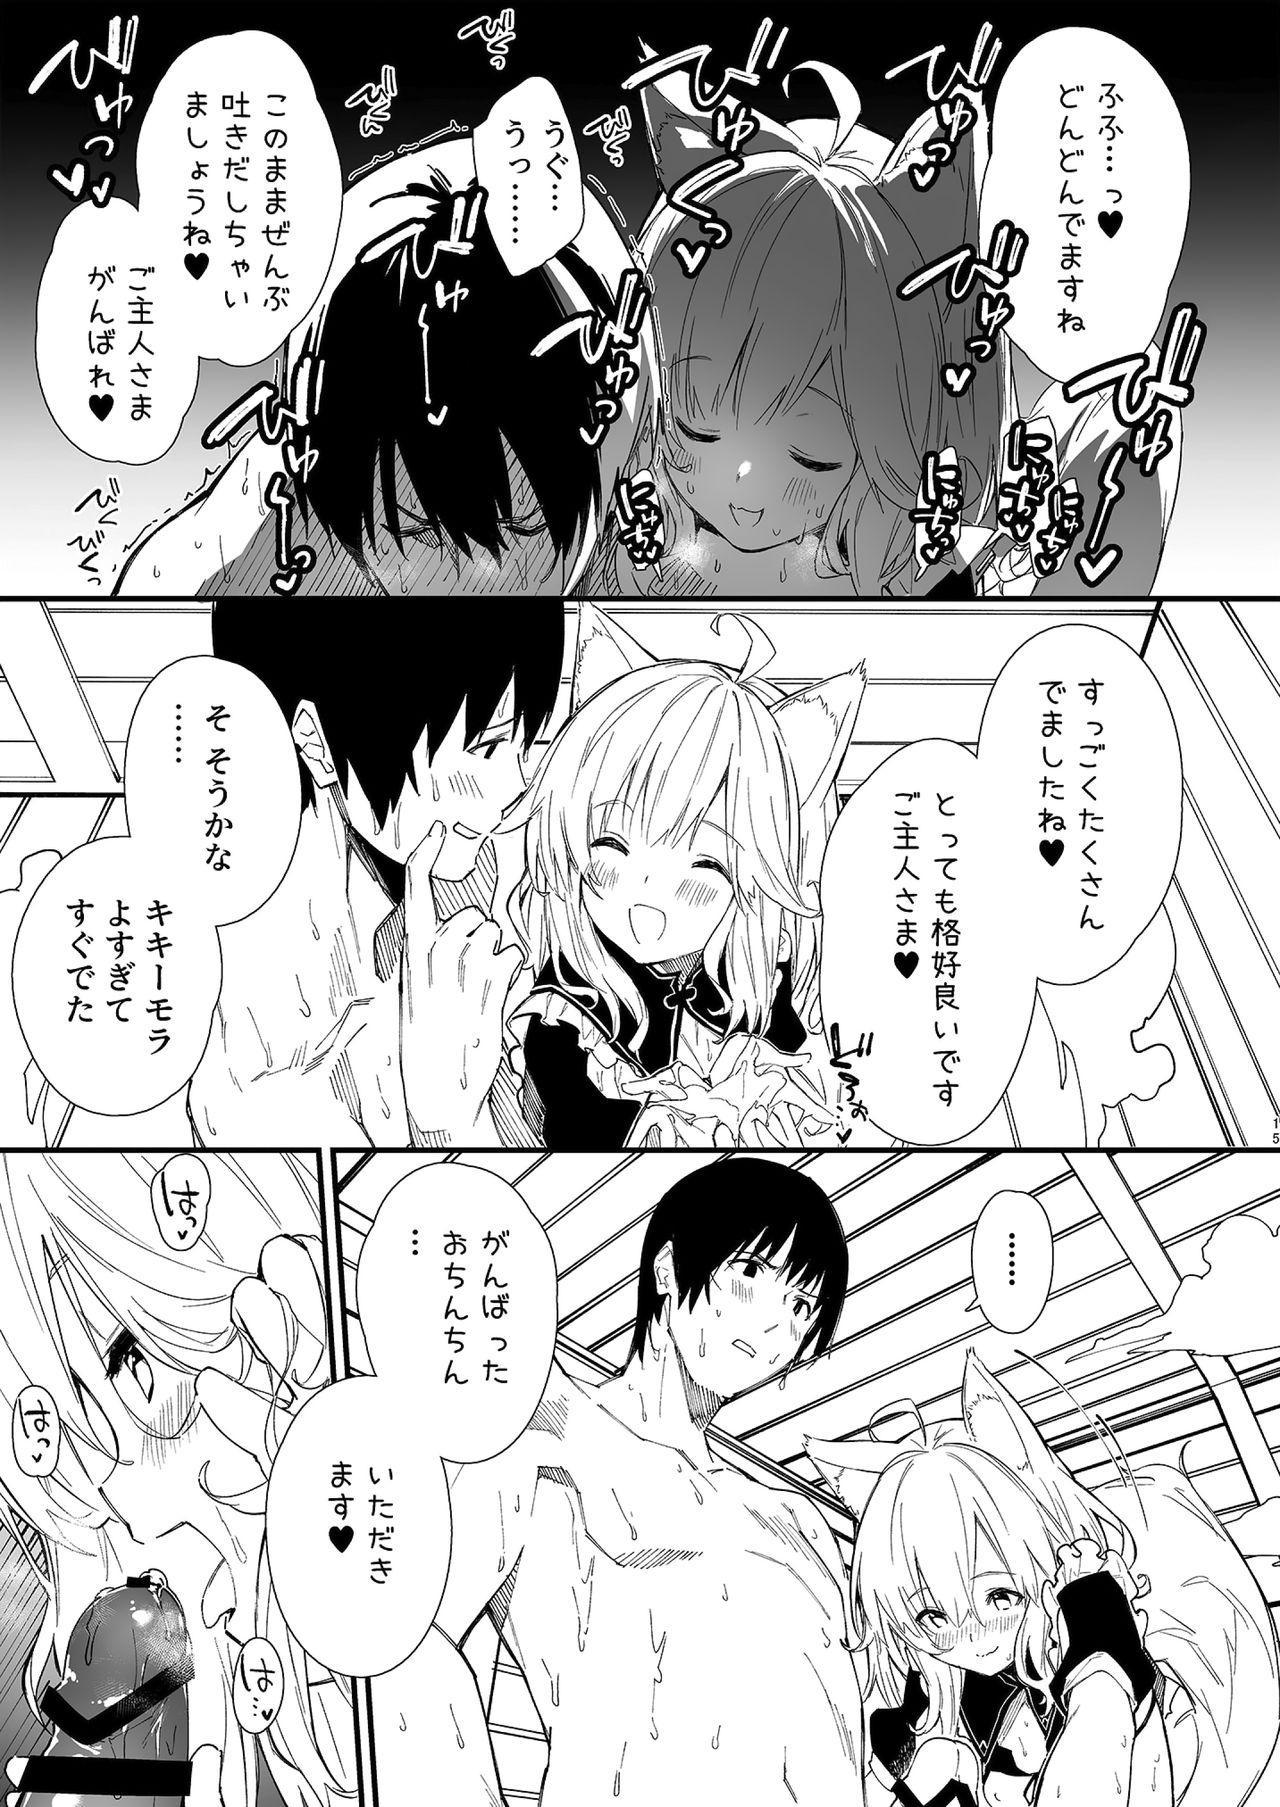 Kemomimi Maid to Ichaicha suru Hon 12